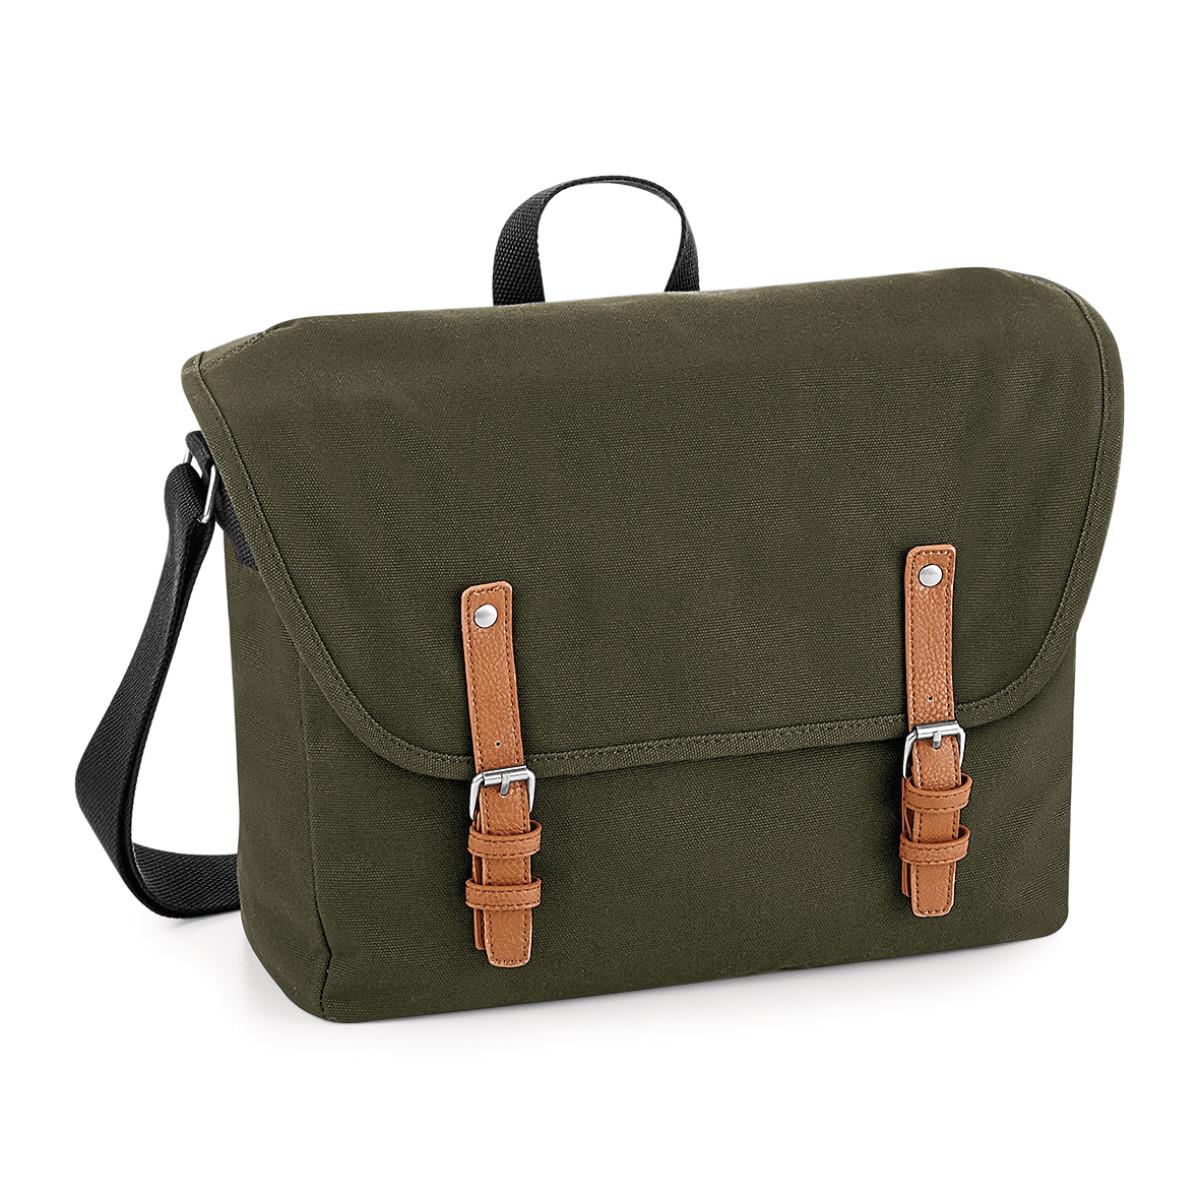 Quadra Vintage Messenger Bag (One Size) (Military Green)